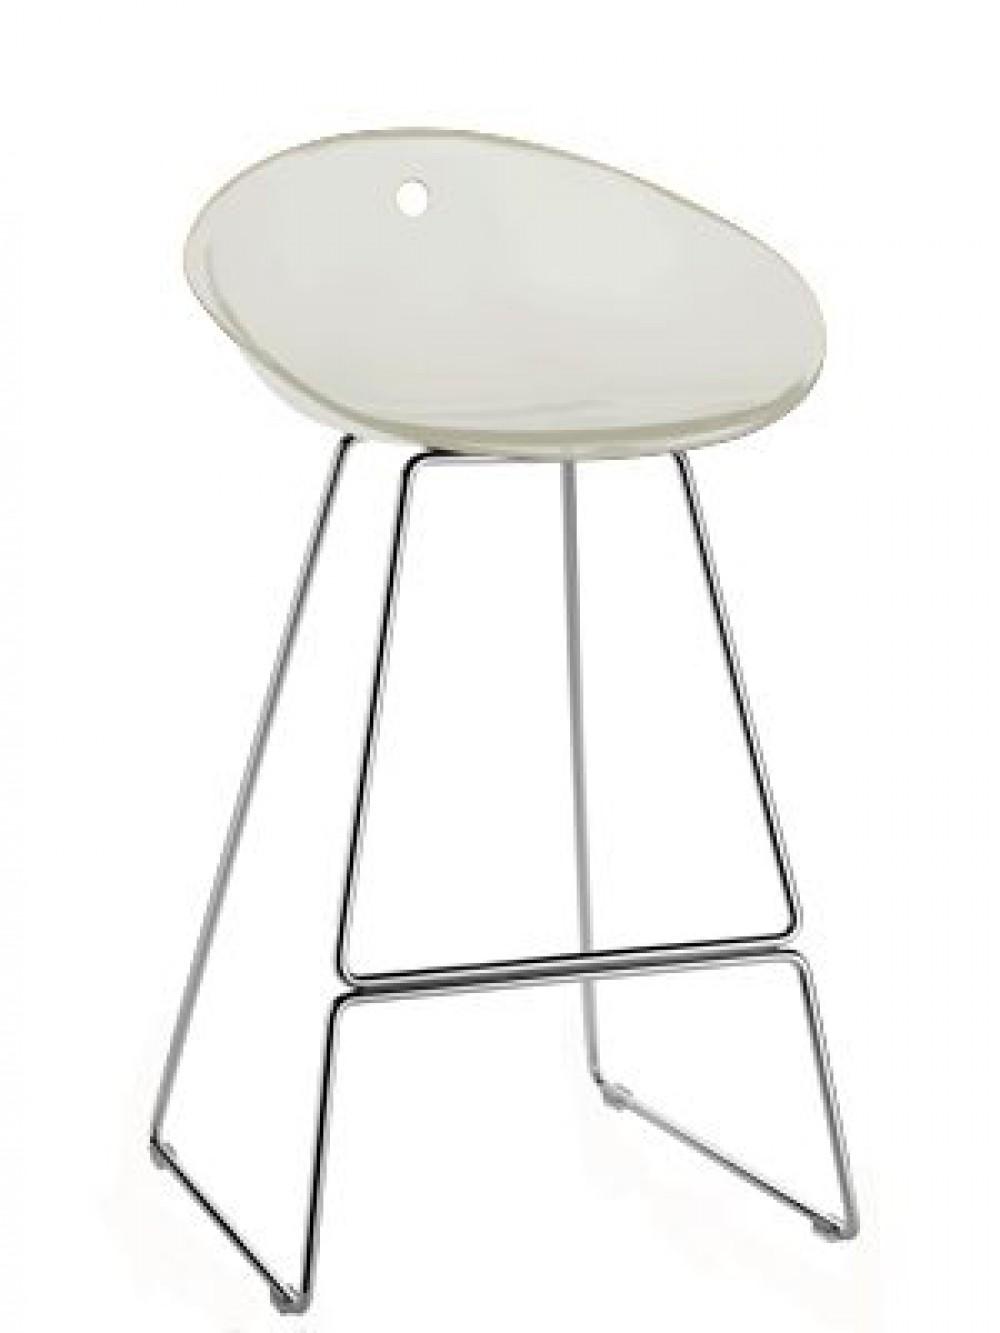 design barhocker farbe weiss 65 cm sitzh he. Black Bedroom Furniture Sets. Home Design Ideas